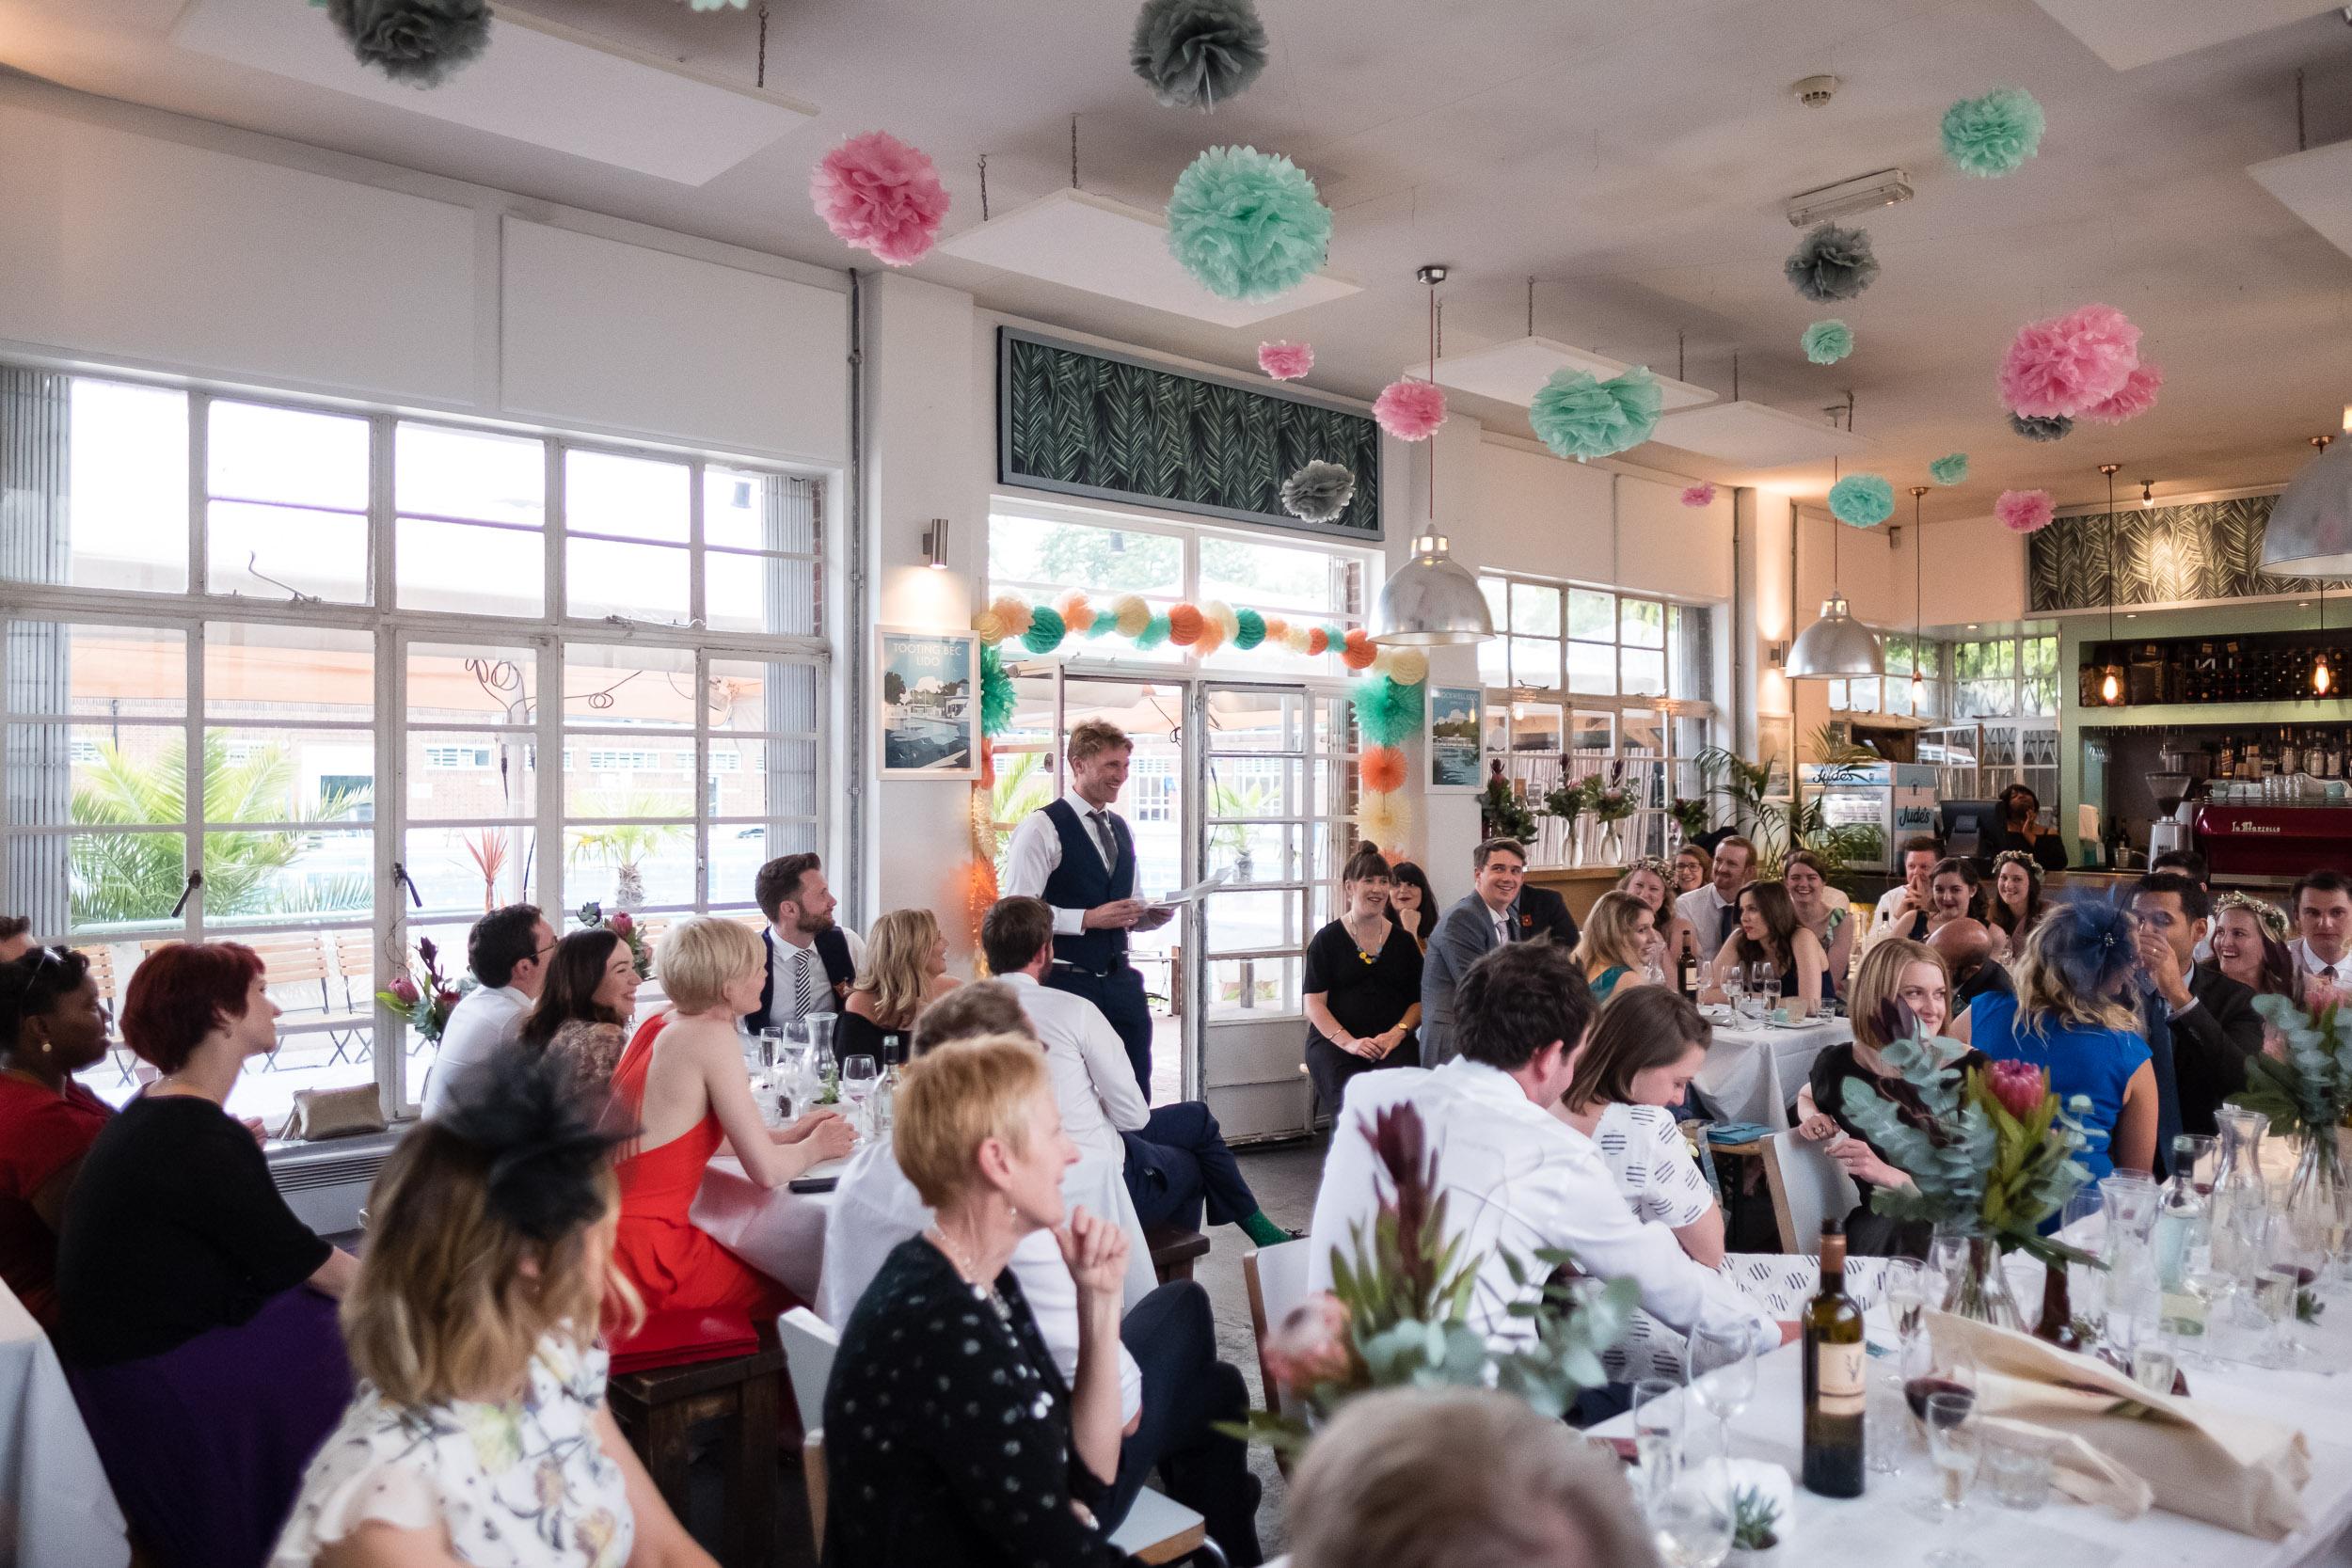 brockwell-lido-brixton-herne-hill-wedding-371.jpg